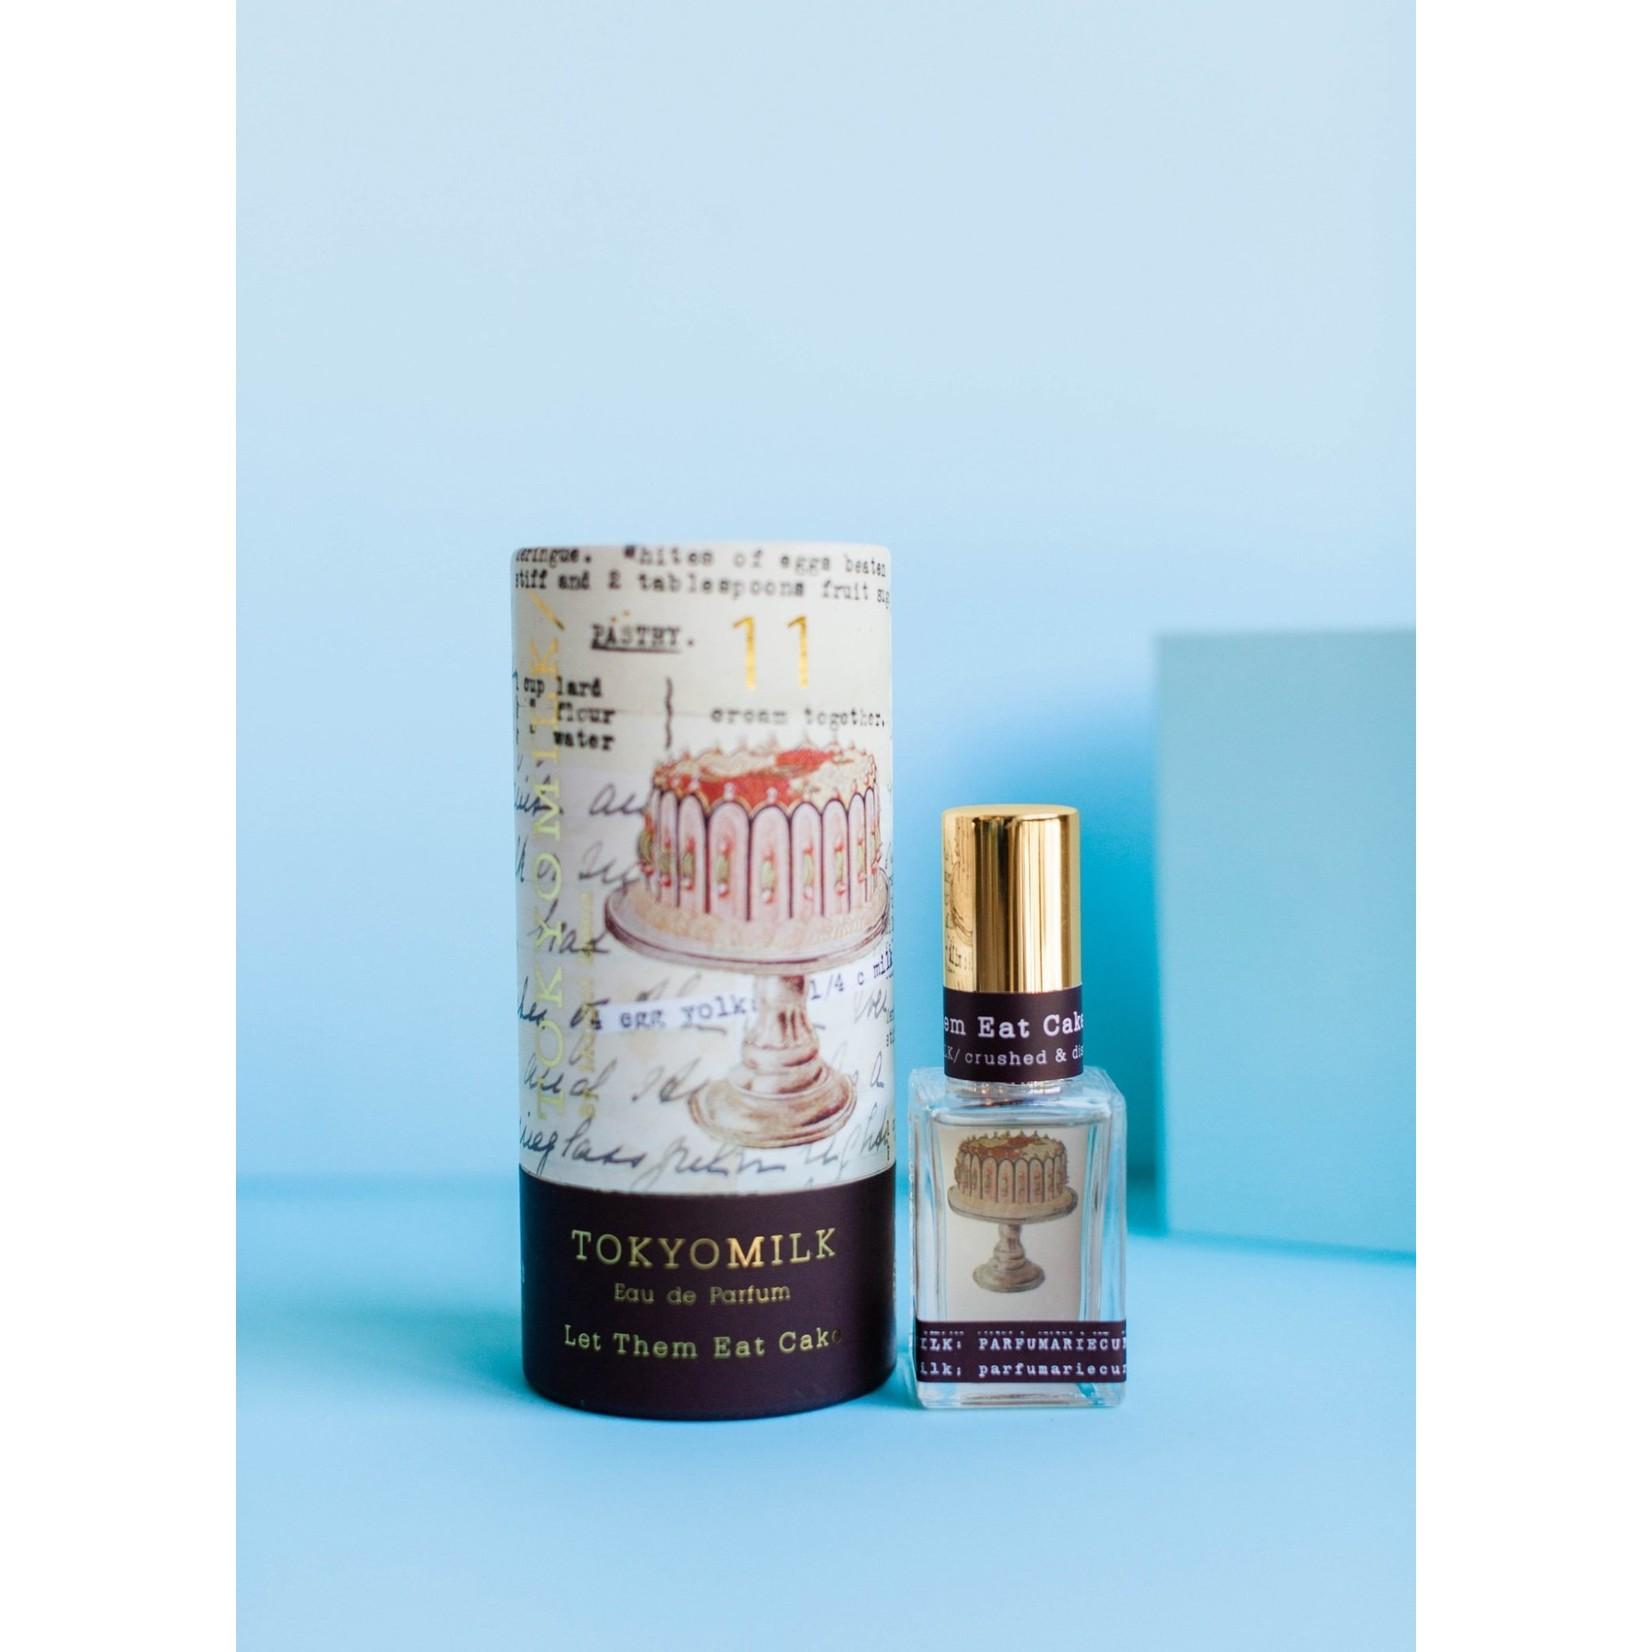 Tokyomilk Parfum Let Them Eat  Cake - No11